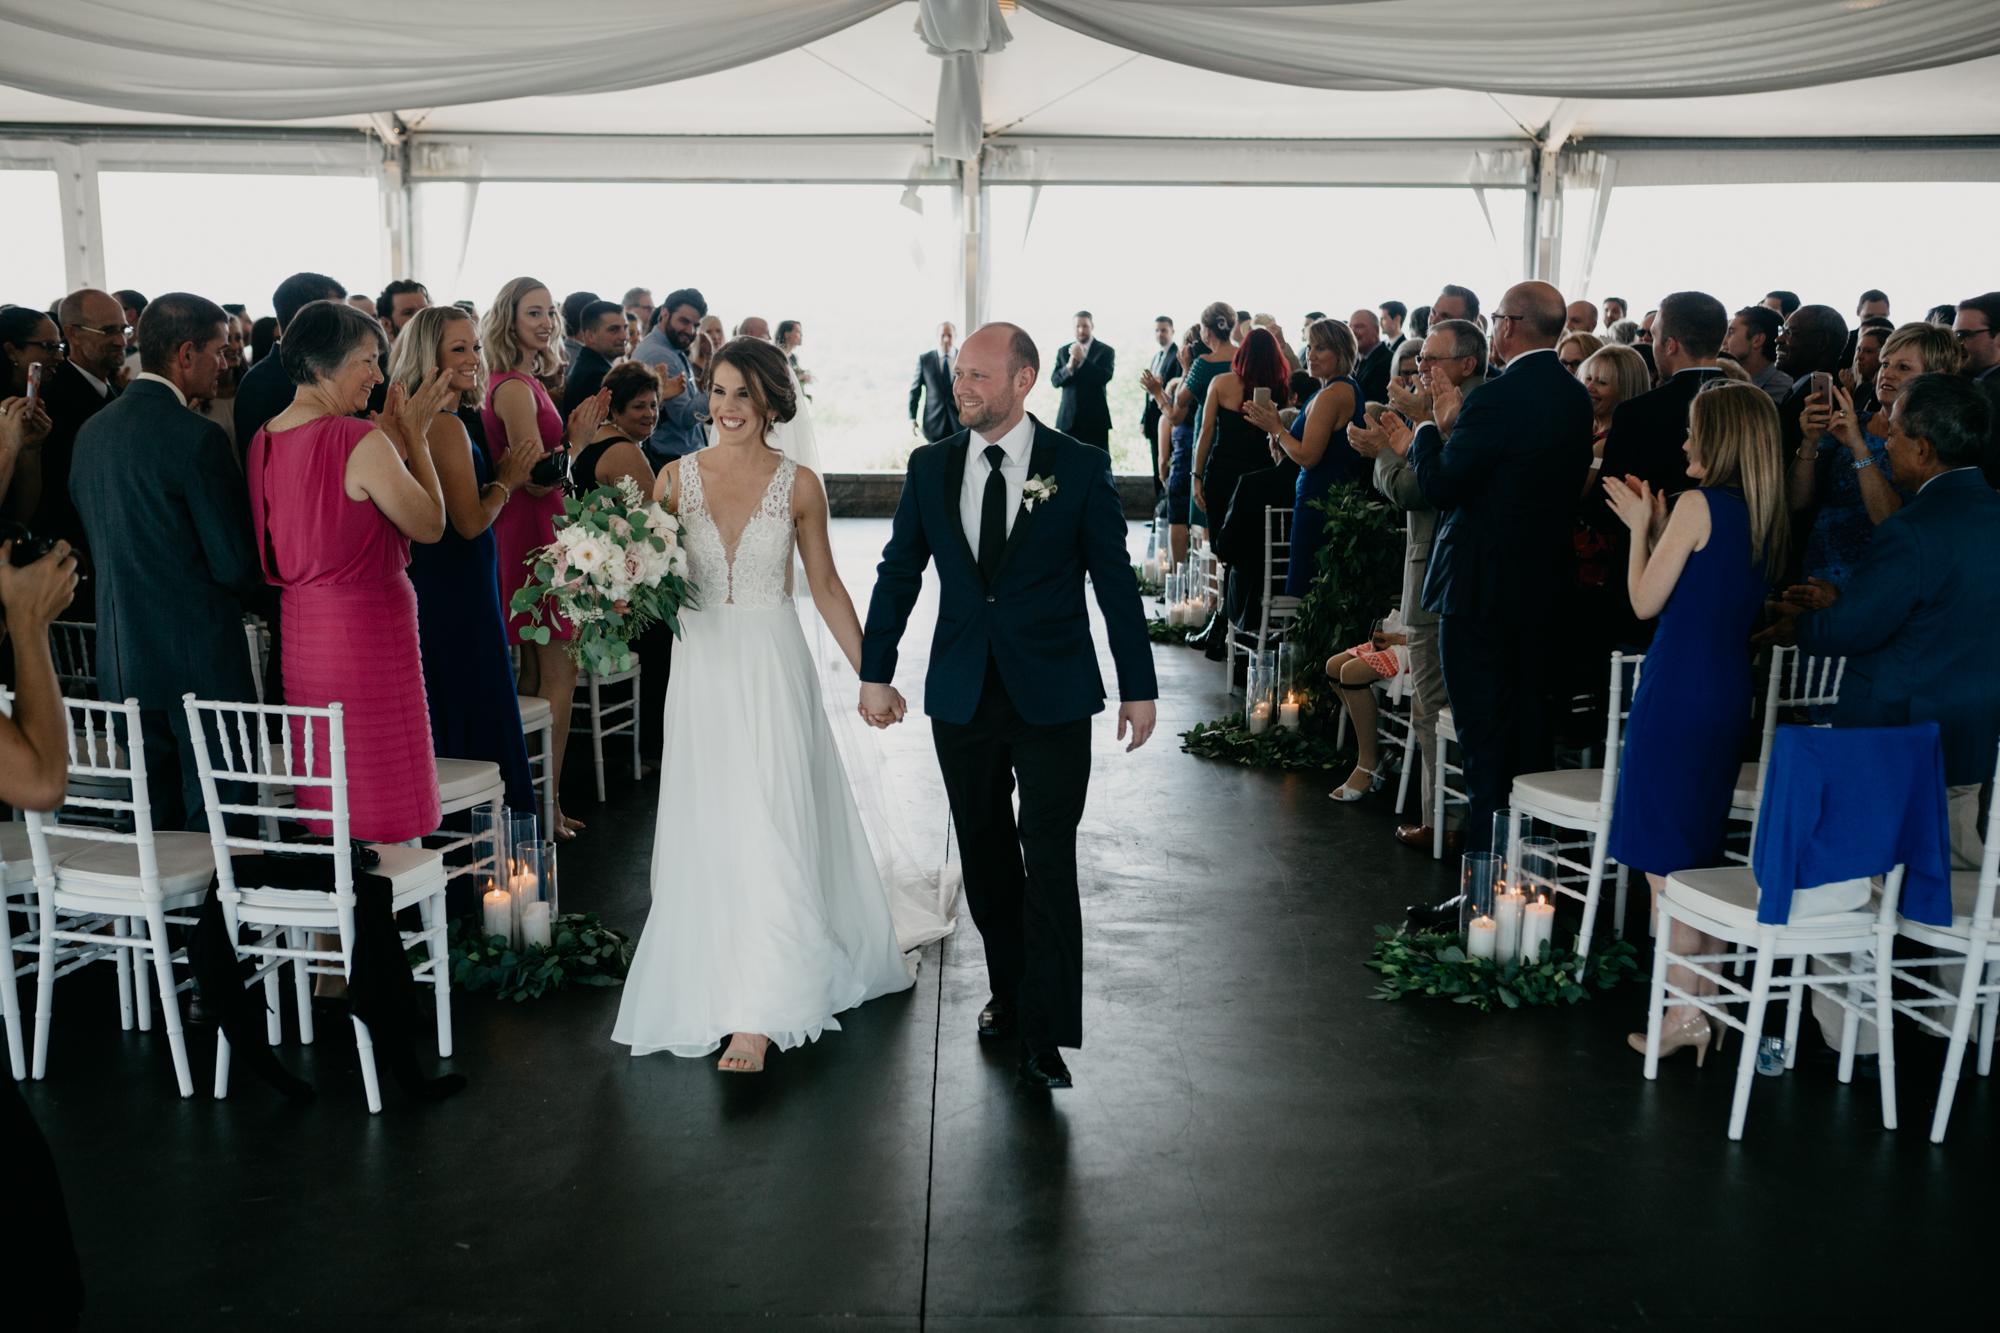 Jaclyn_Andrew_quincy_massachusetts_wedding016.jpg